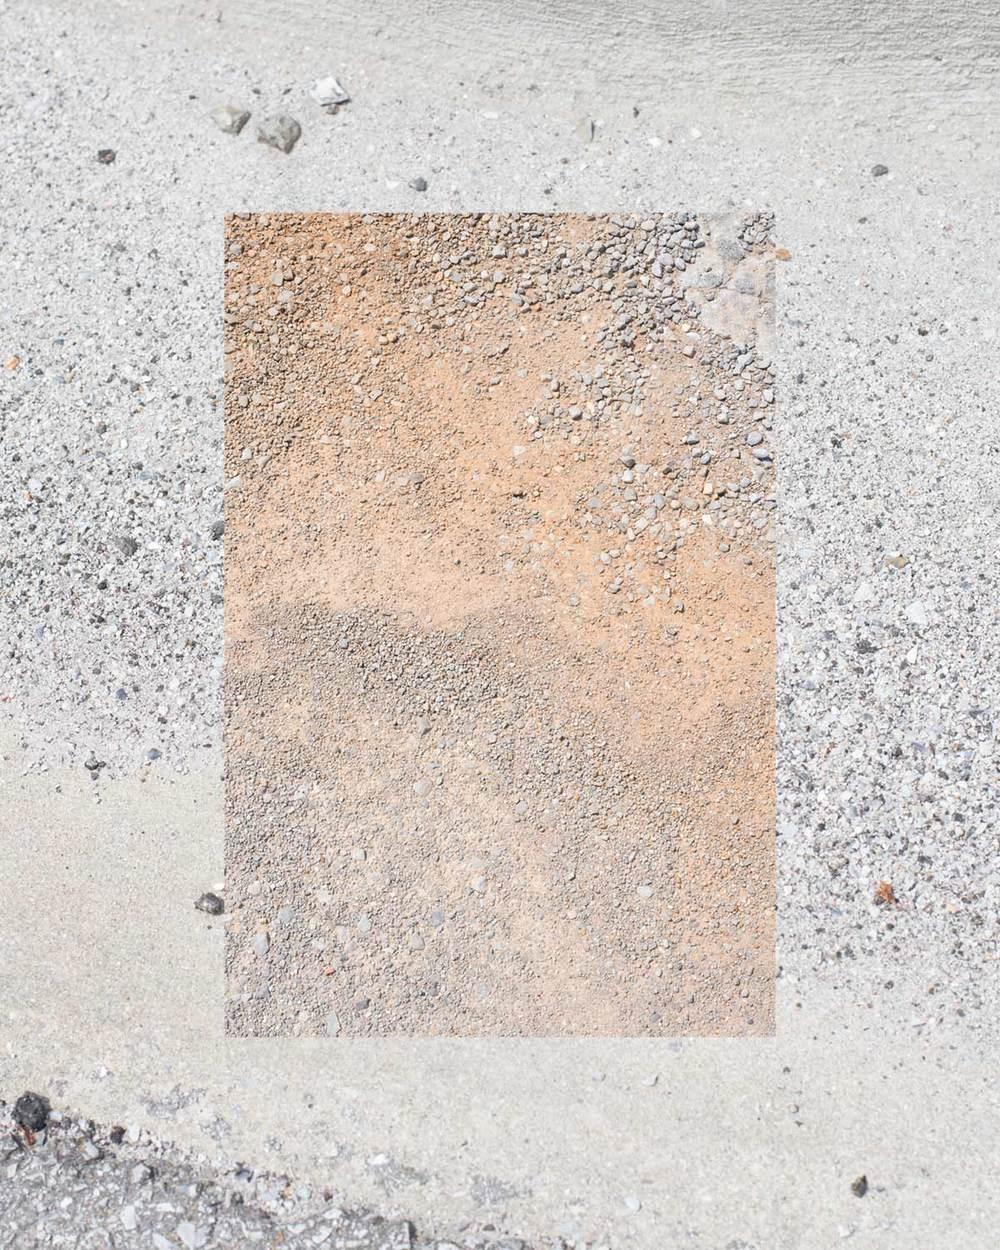 pavement-over-web-1500.jpg